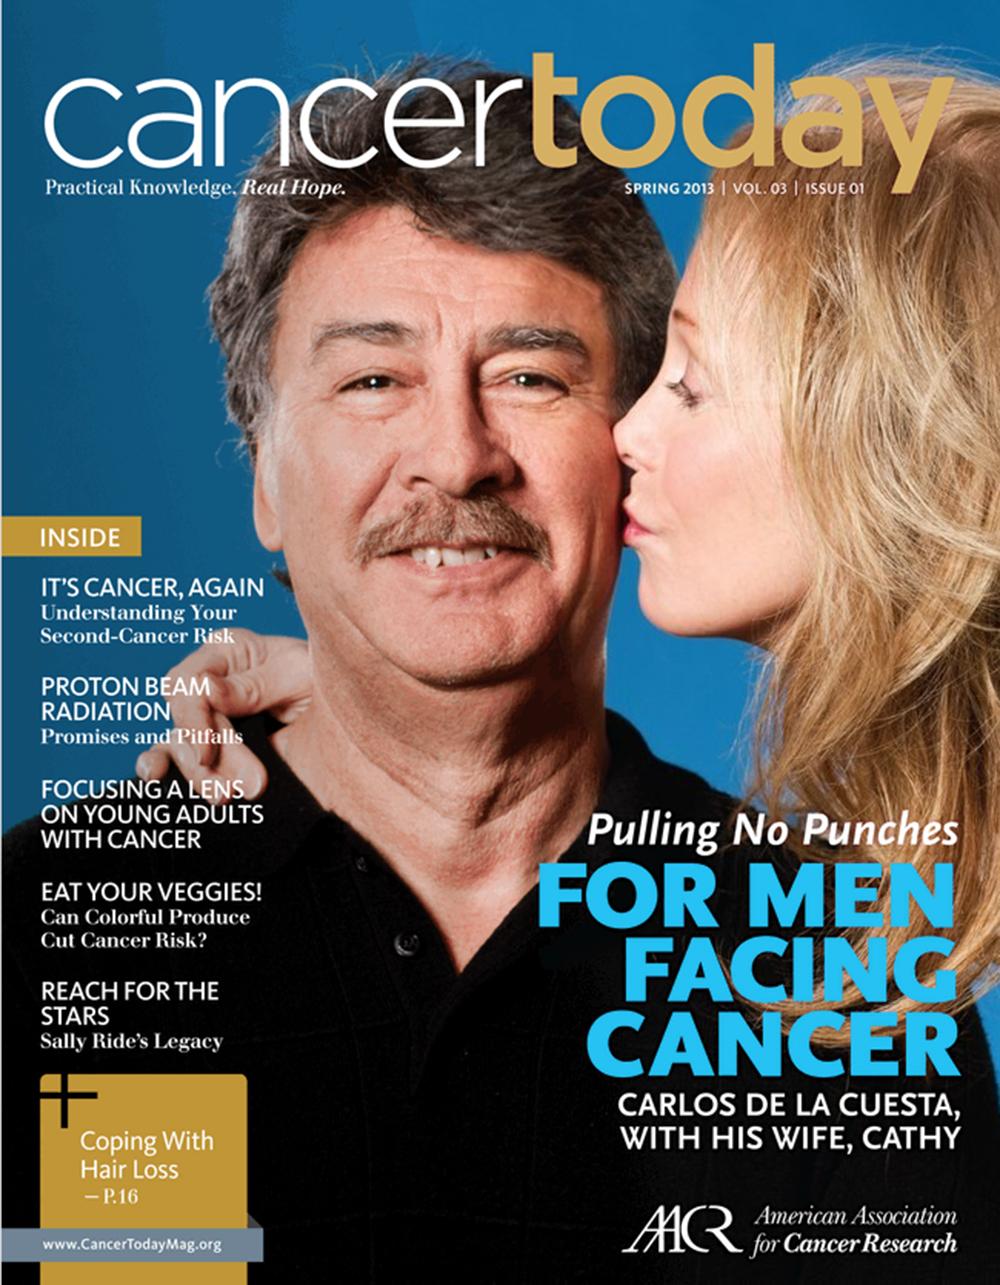 CancerTodayMagazineSpring2013_1.jpg